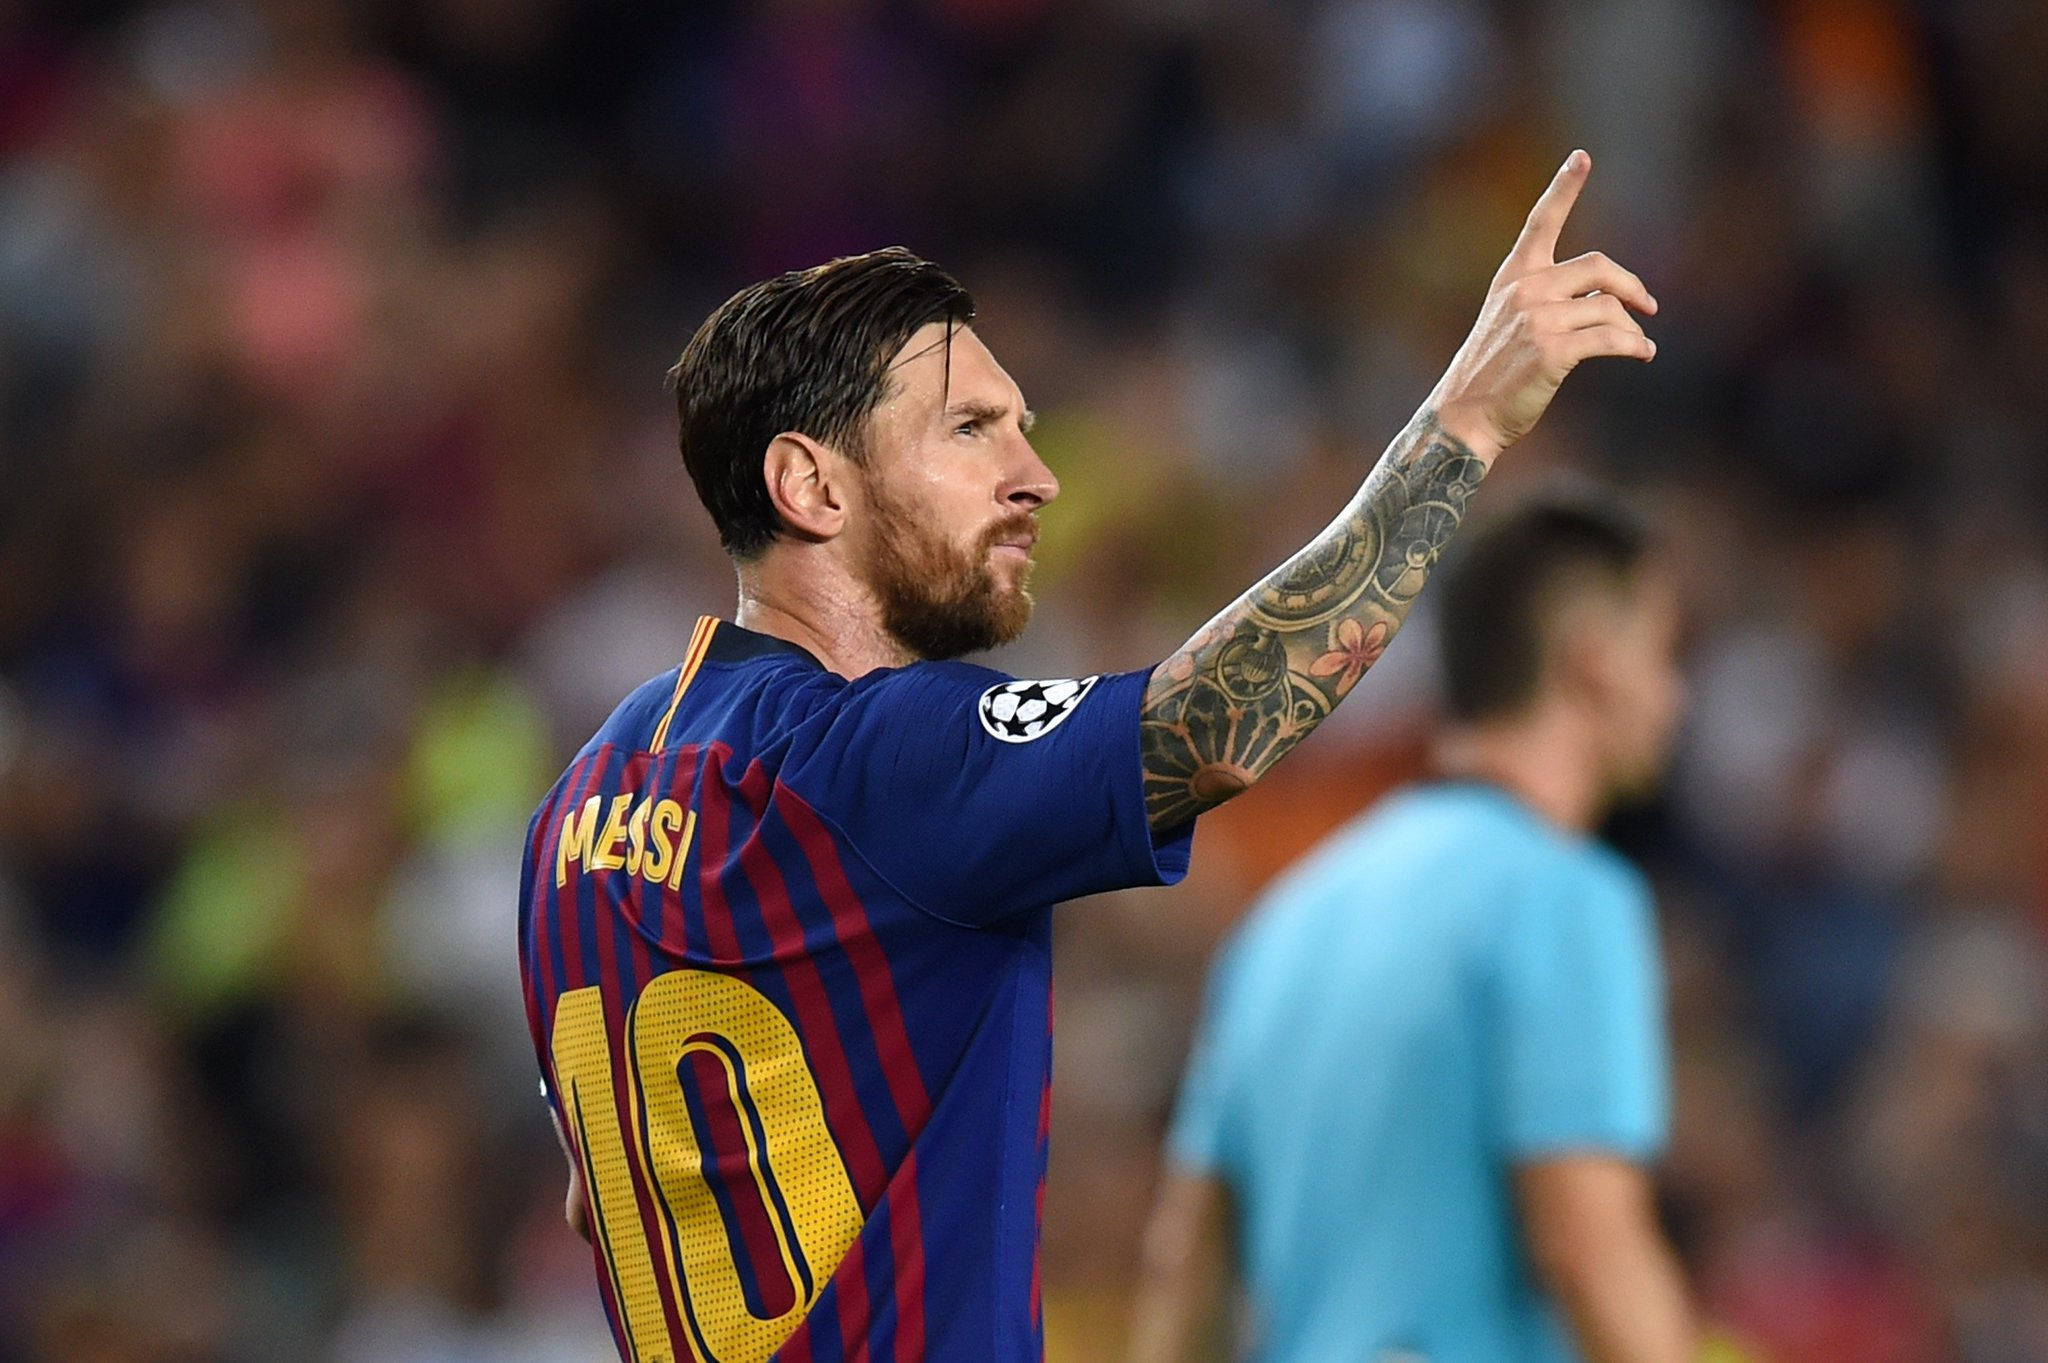 Leo Messi has now scored a record 8⃣ #UCL hat-tricks ⚽️⚽️⚽️ https://t.co/VmQFdzrKO0